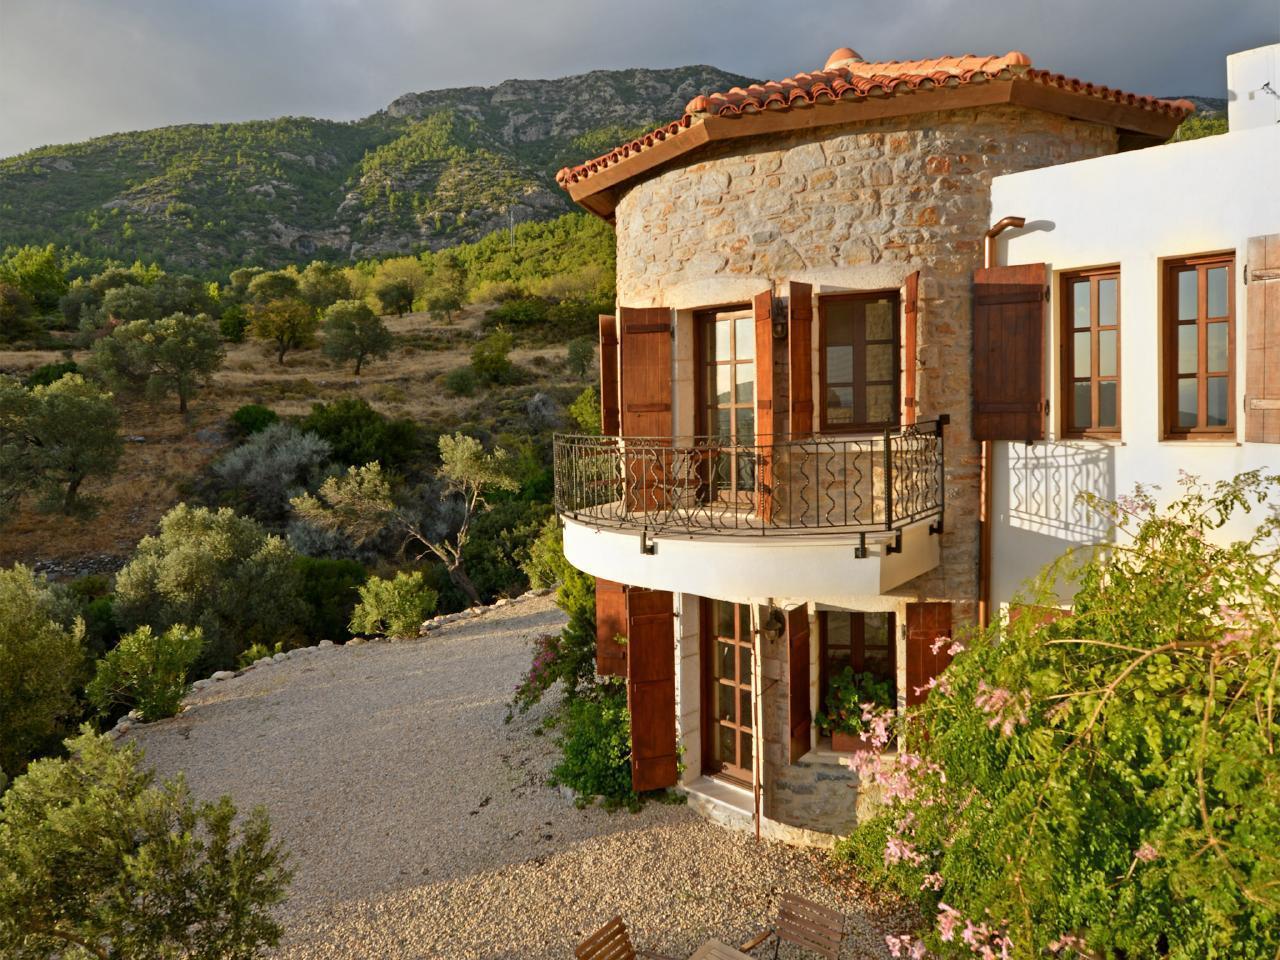 Maison de vacances Exklusives Chalet, romantisch am Berghang und Meer gelegen (2506674), Mesudiye, , Région Egéenne, Turquie, image 13